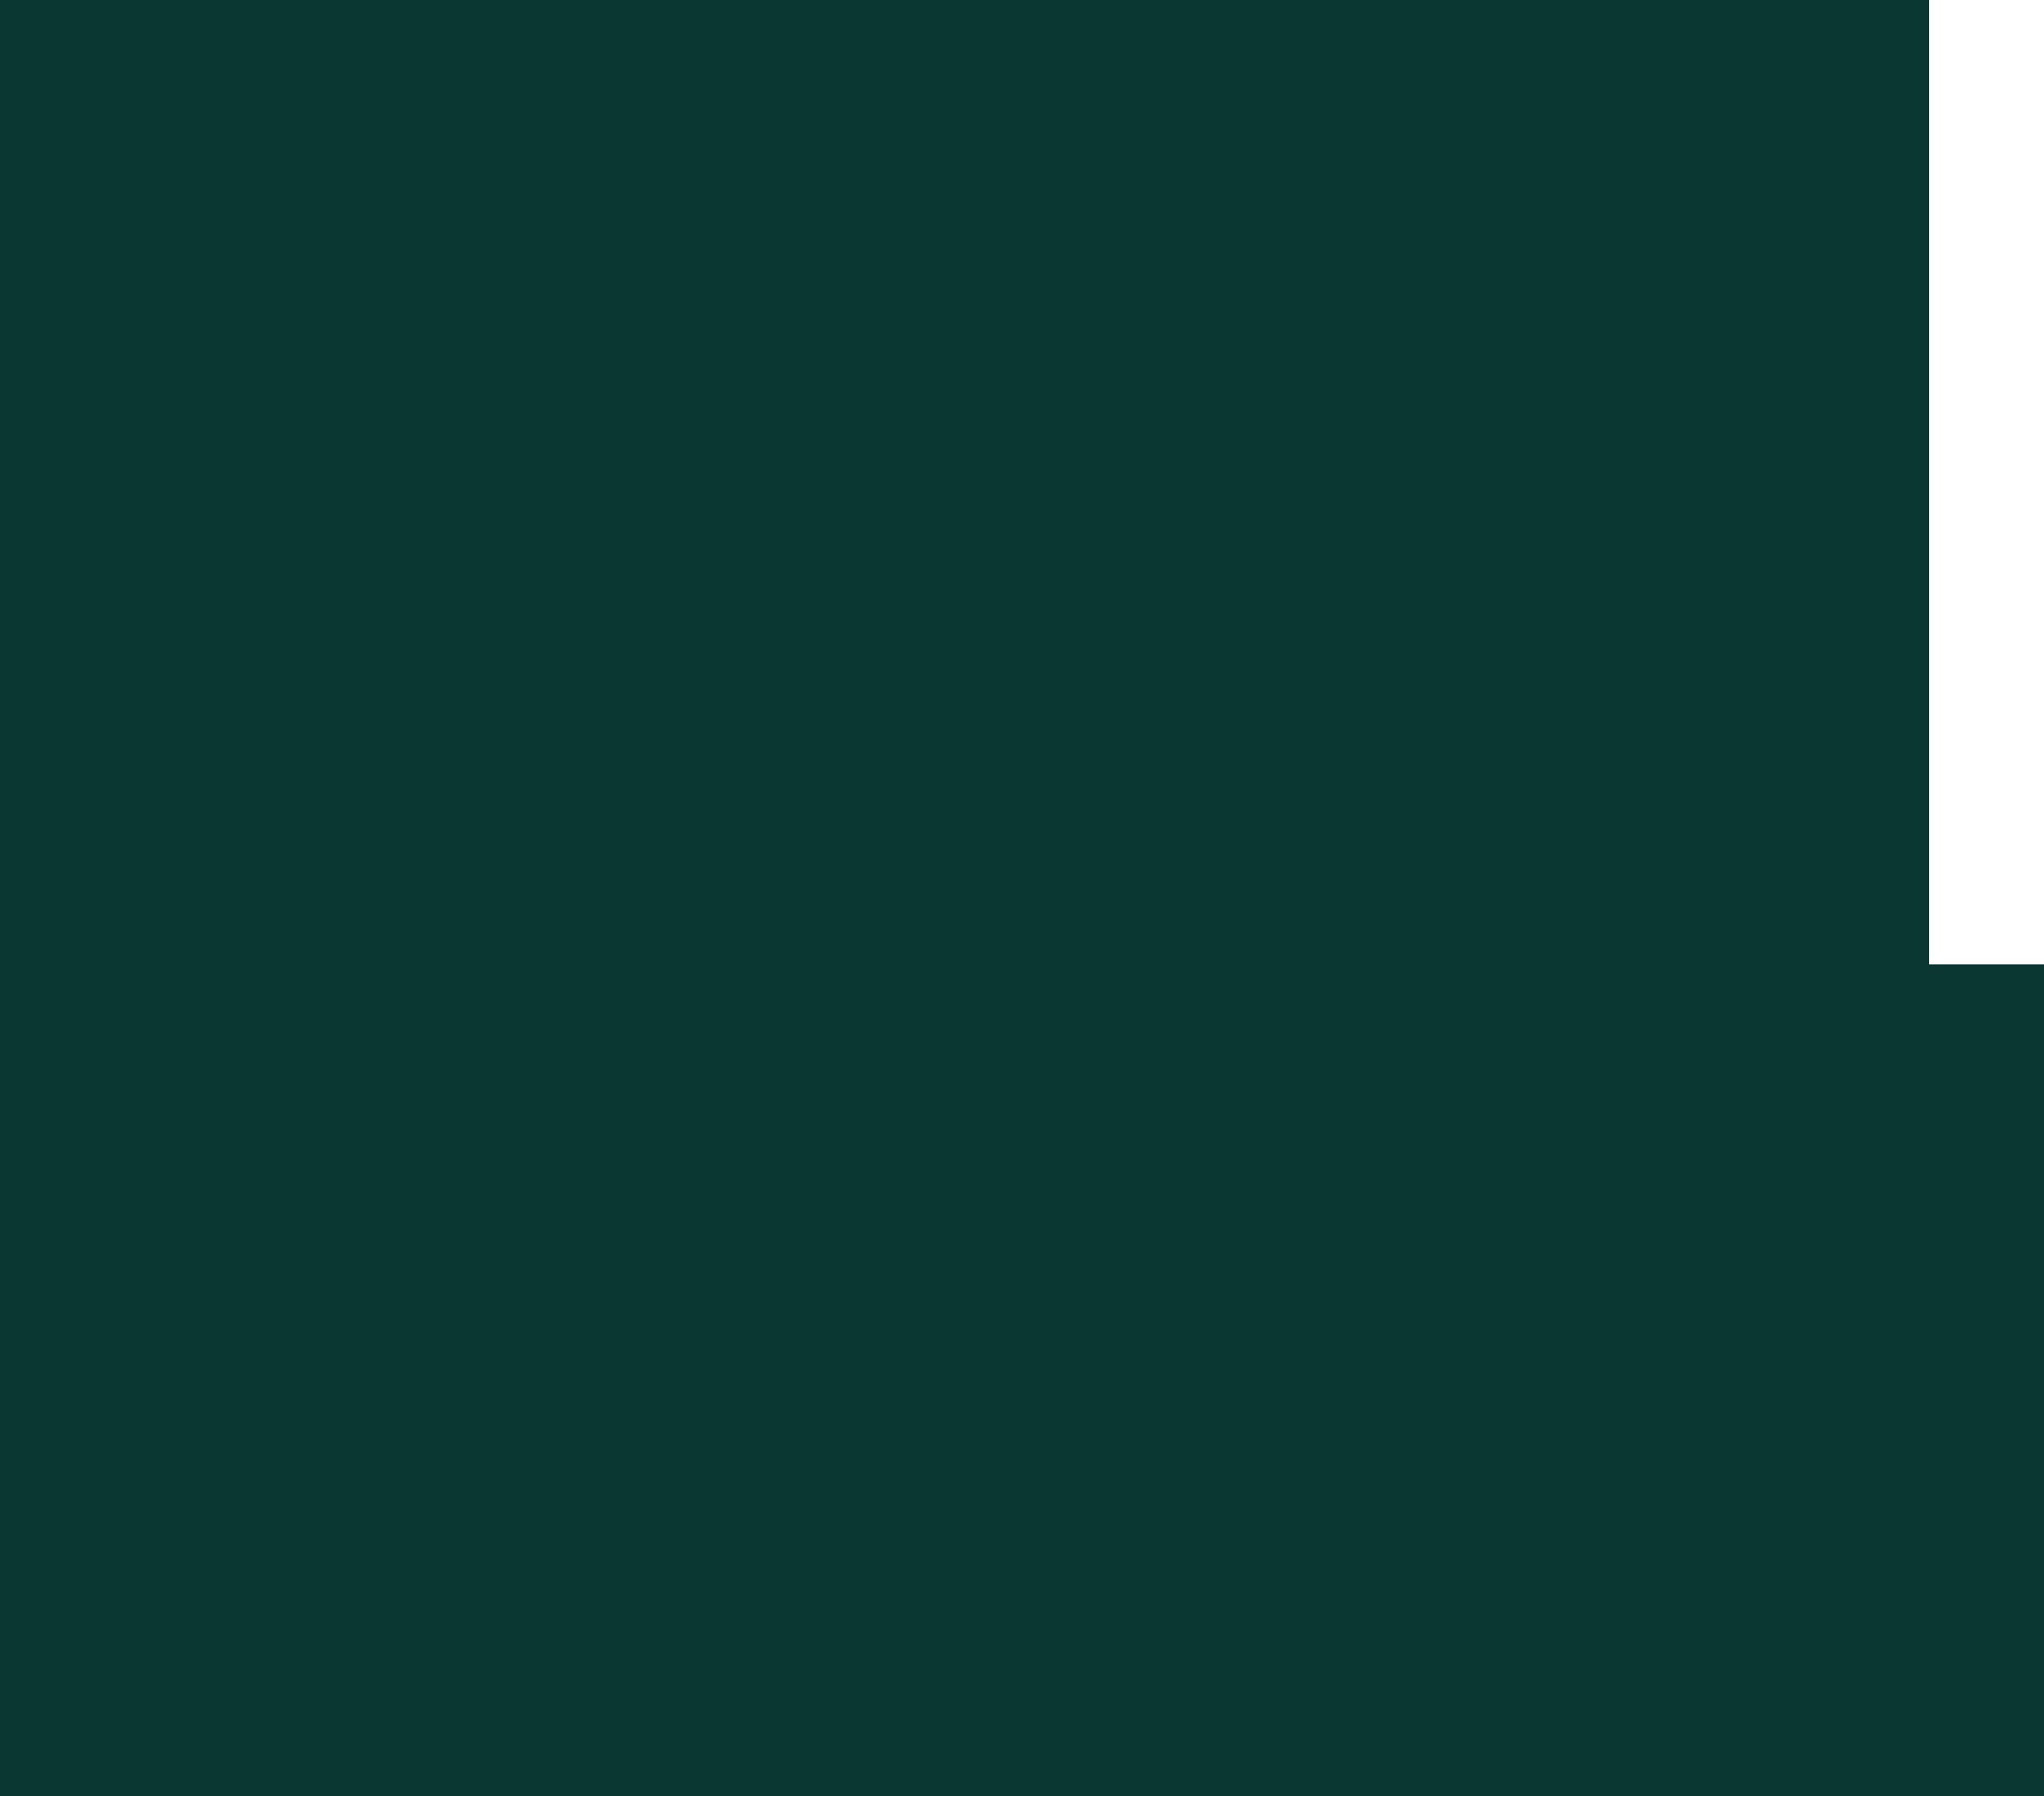 Hoof Hearted Logo - Green